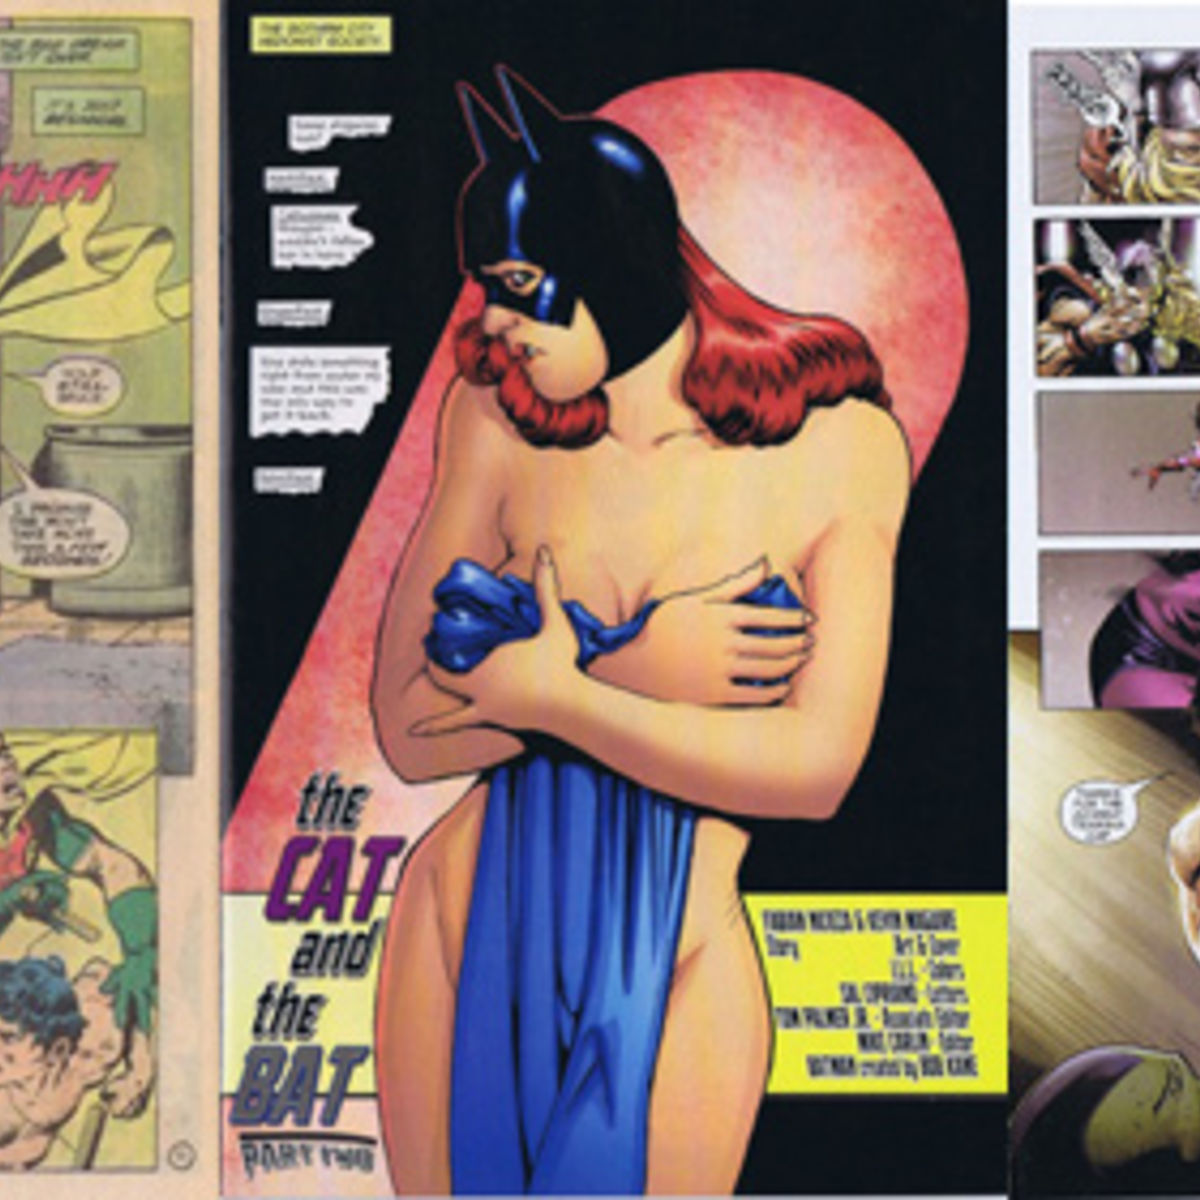 ComicBookNudeScenesLead.jpg